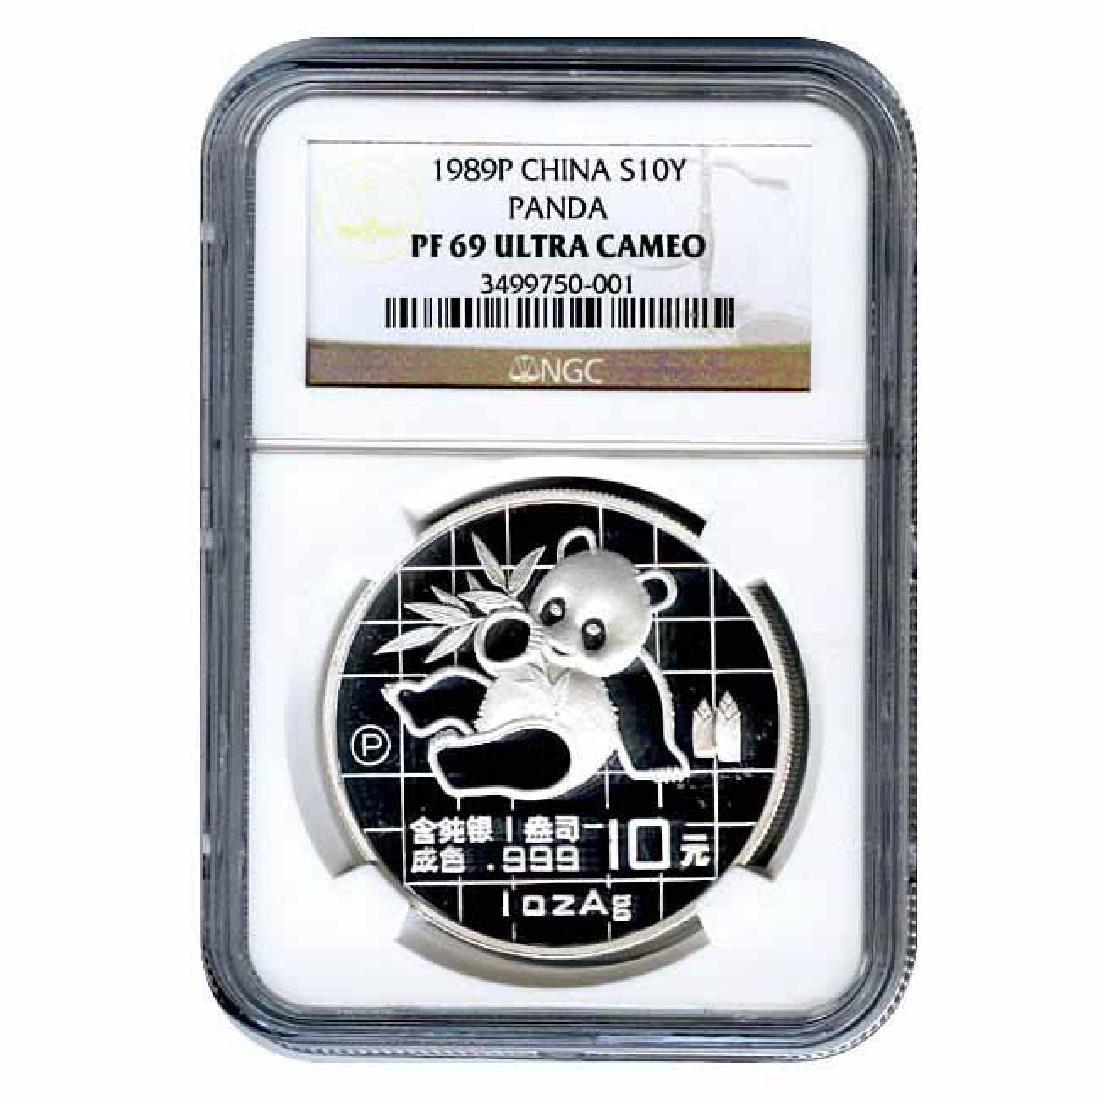 Certified Chinese Panda One Ounce 1989 PF69 NGC